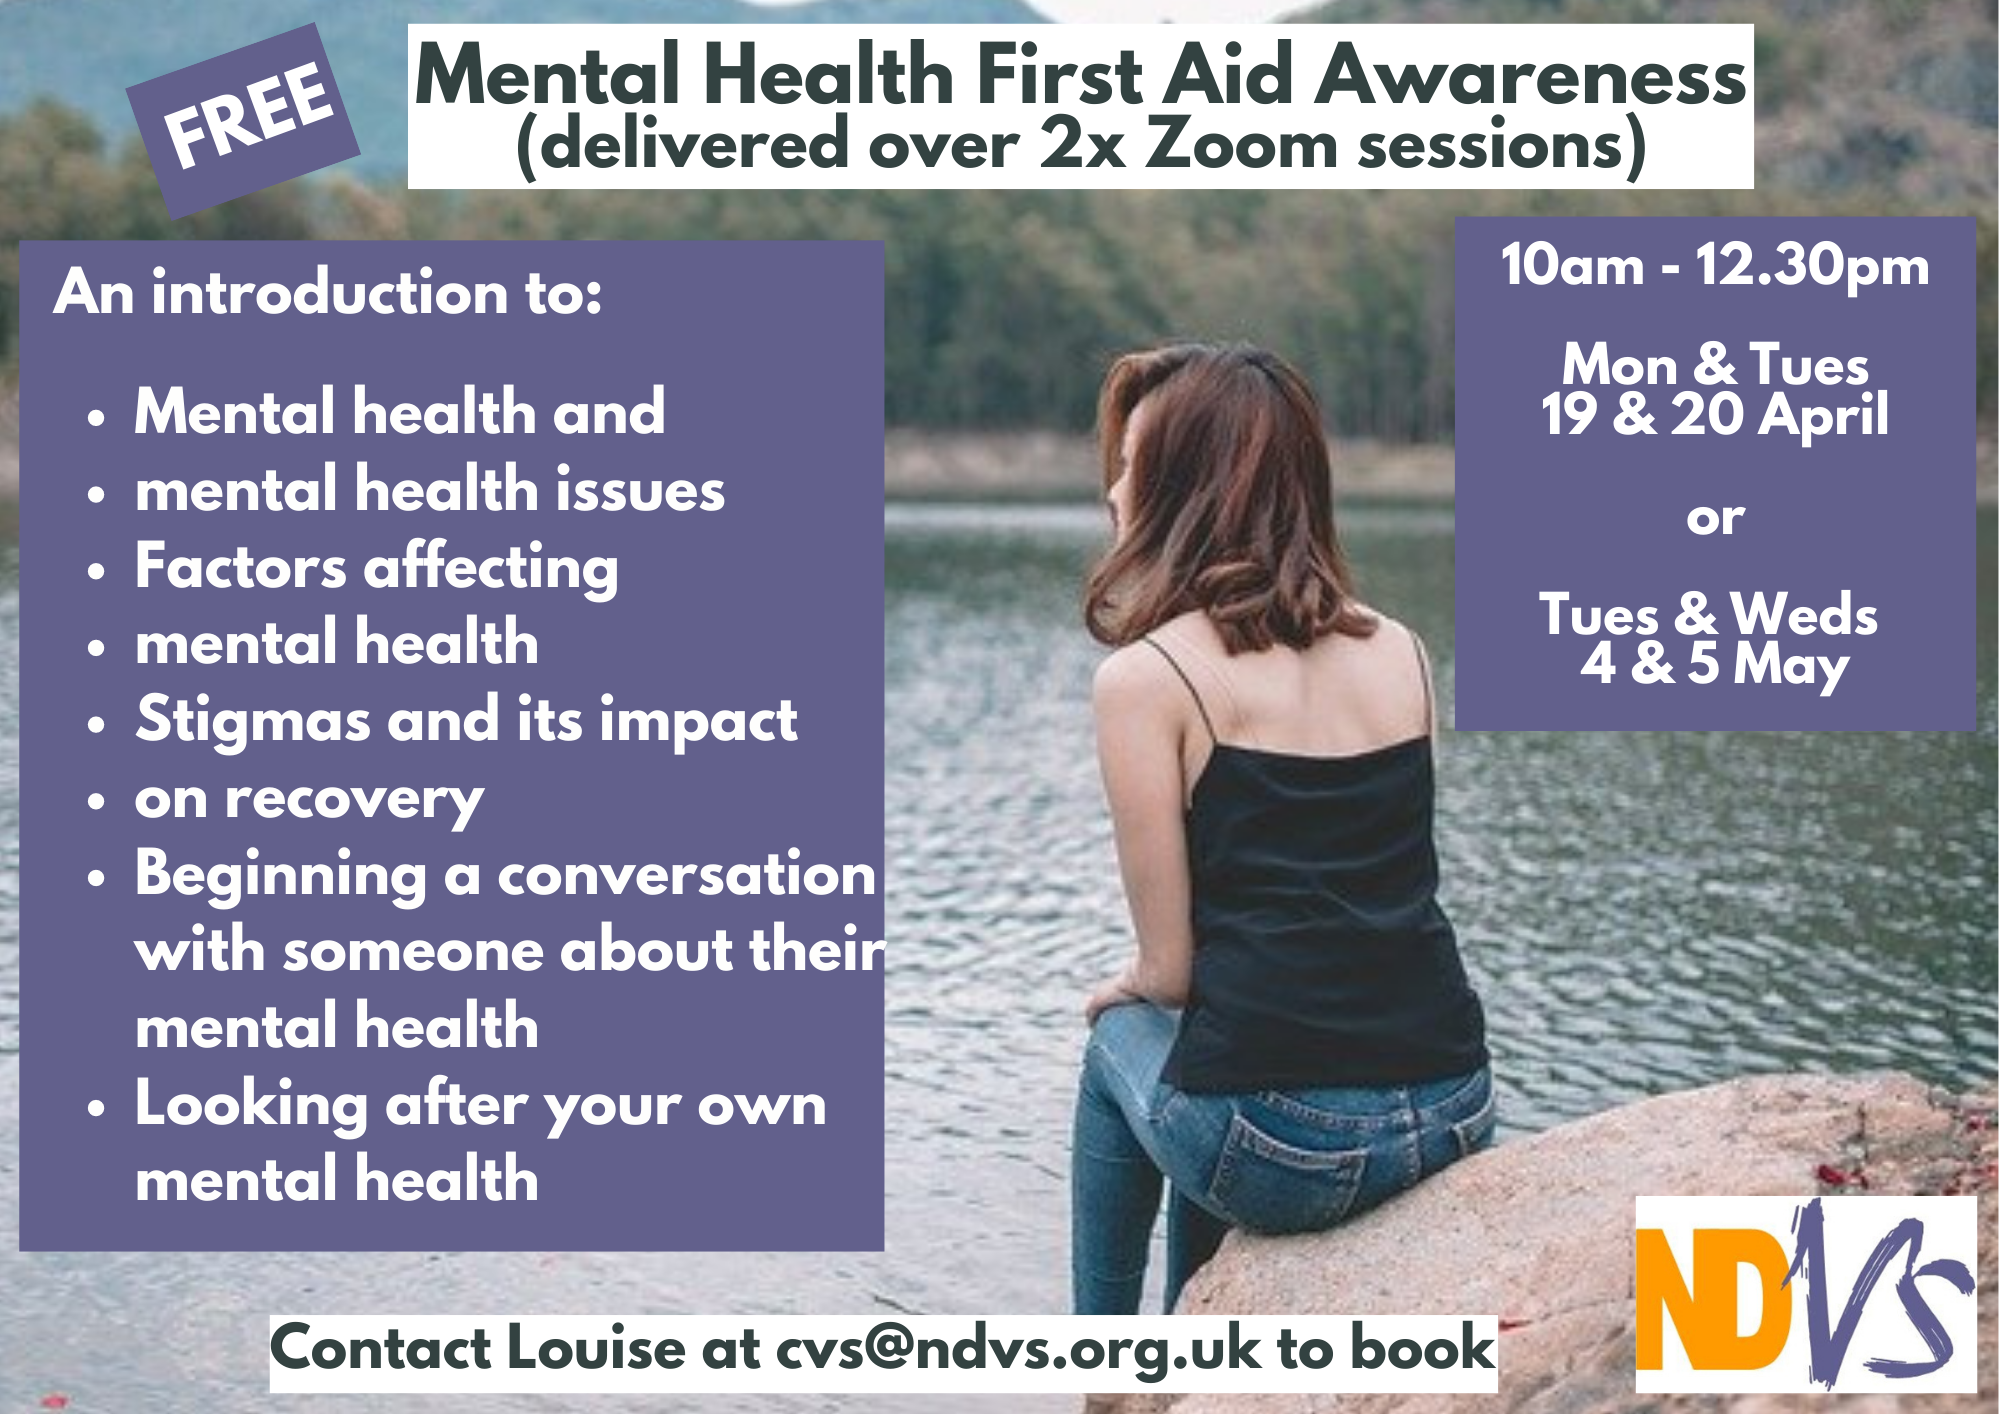 MHFA Awareness flyer April-May 21